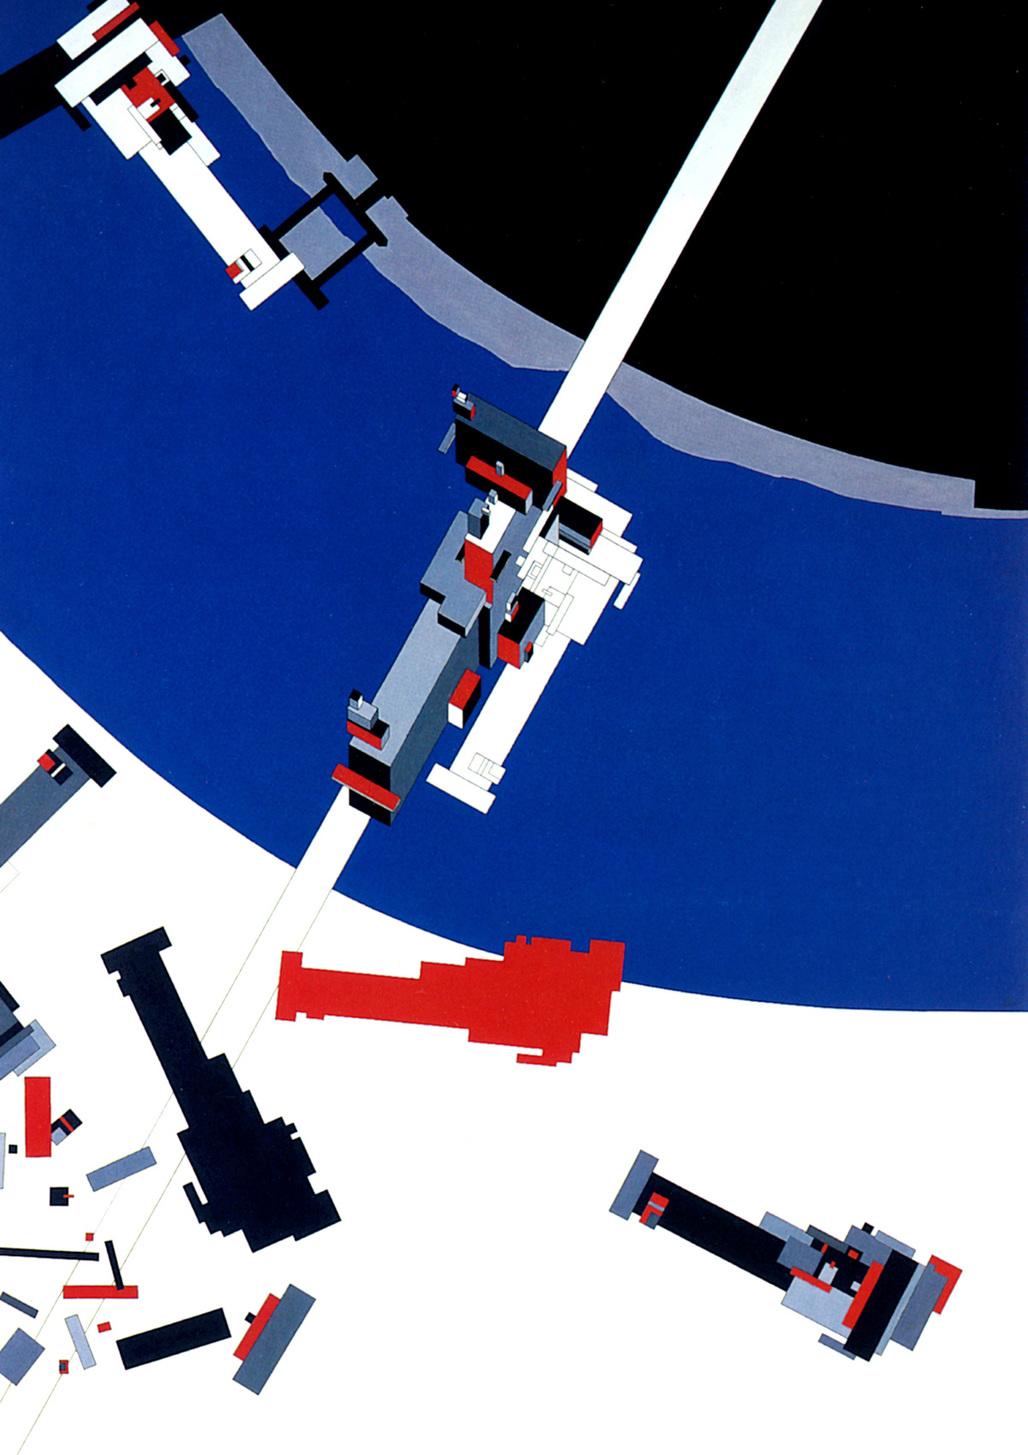 Malevichs Tektonik. Painting by Zaha Hadid. Image via http://www.arcspace.com/